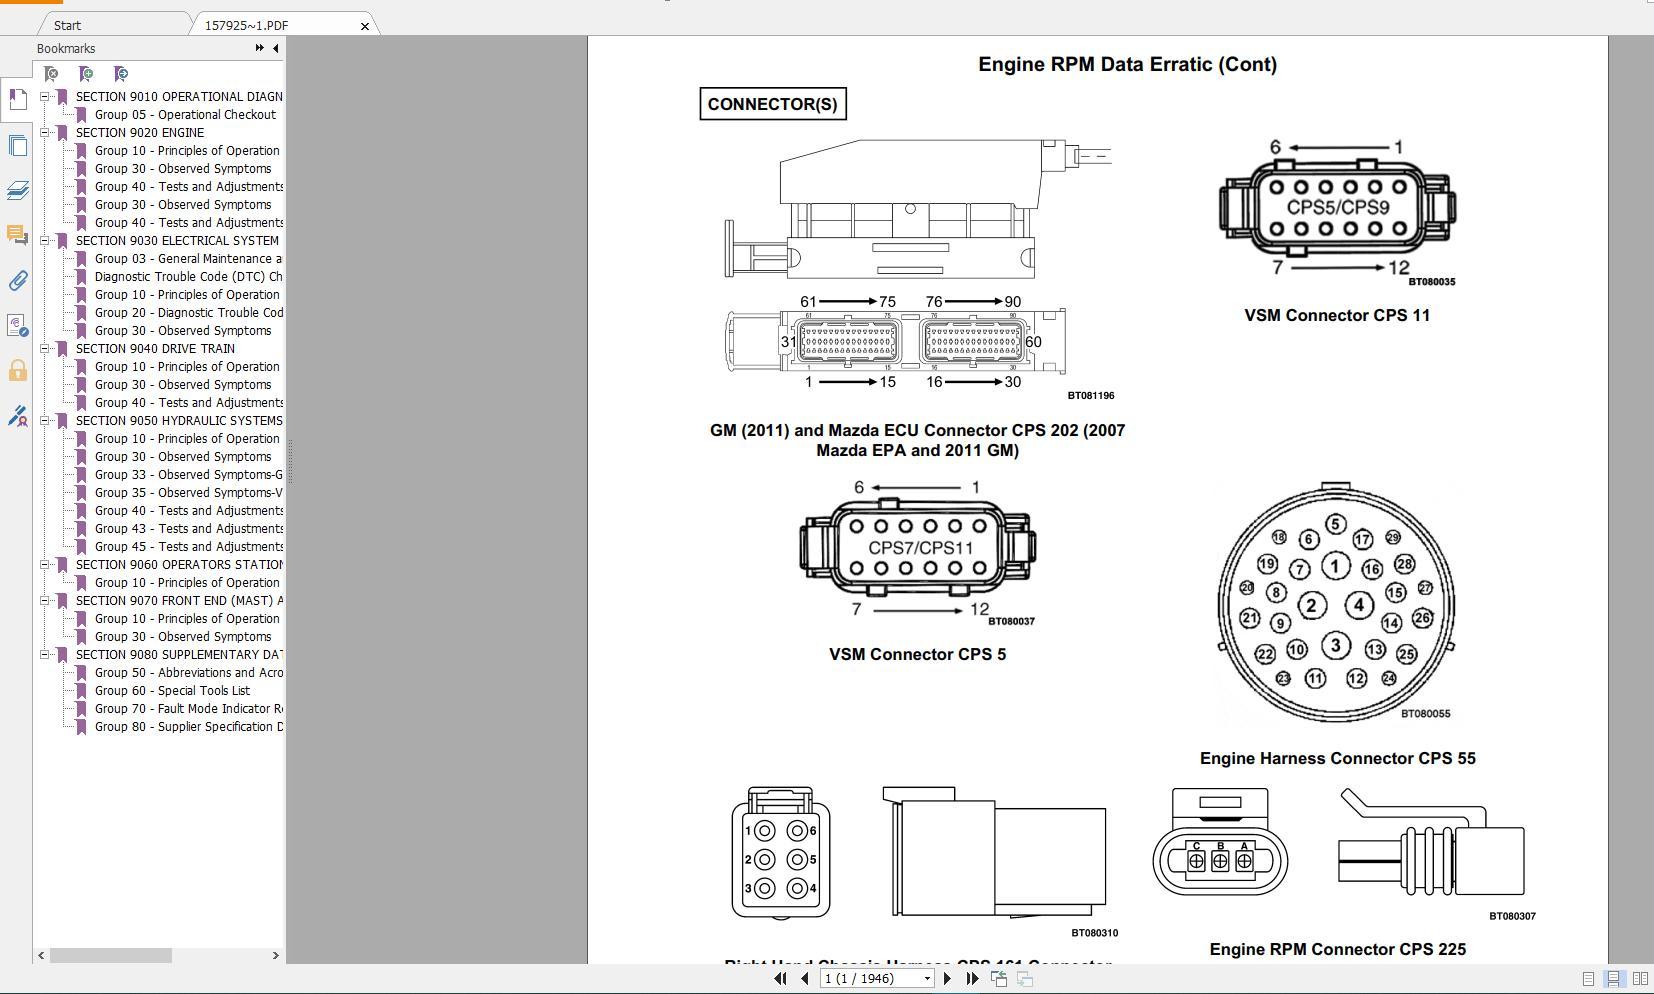 Hyster_Forklift_Class_4_Internal_Combustion_Engine_Trucks_Repair_Manuals12